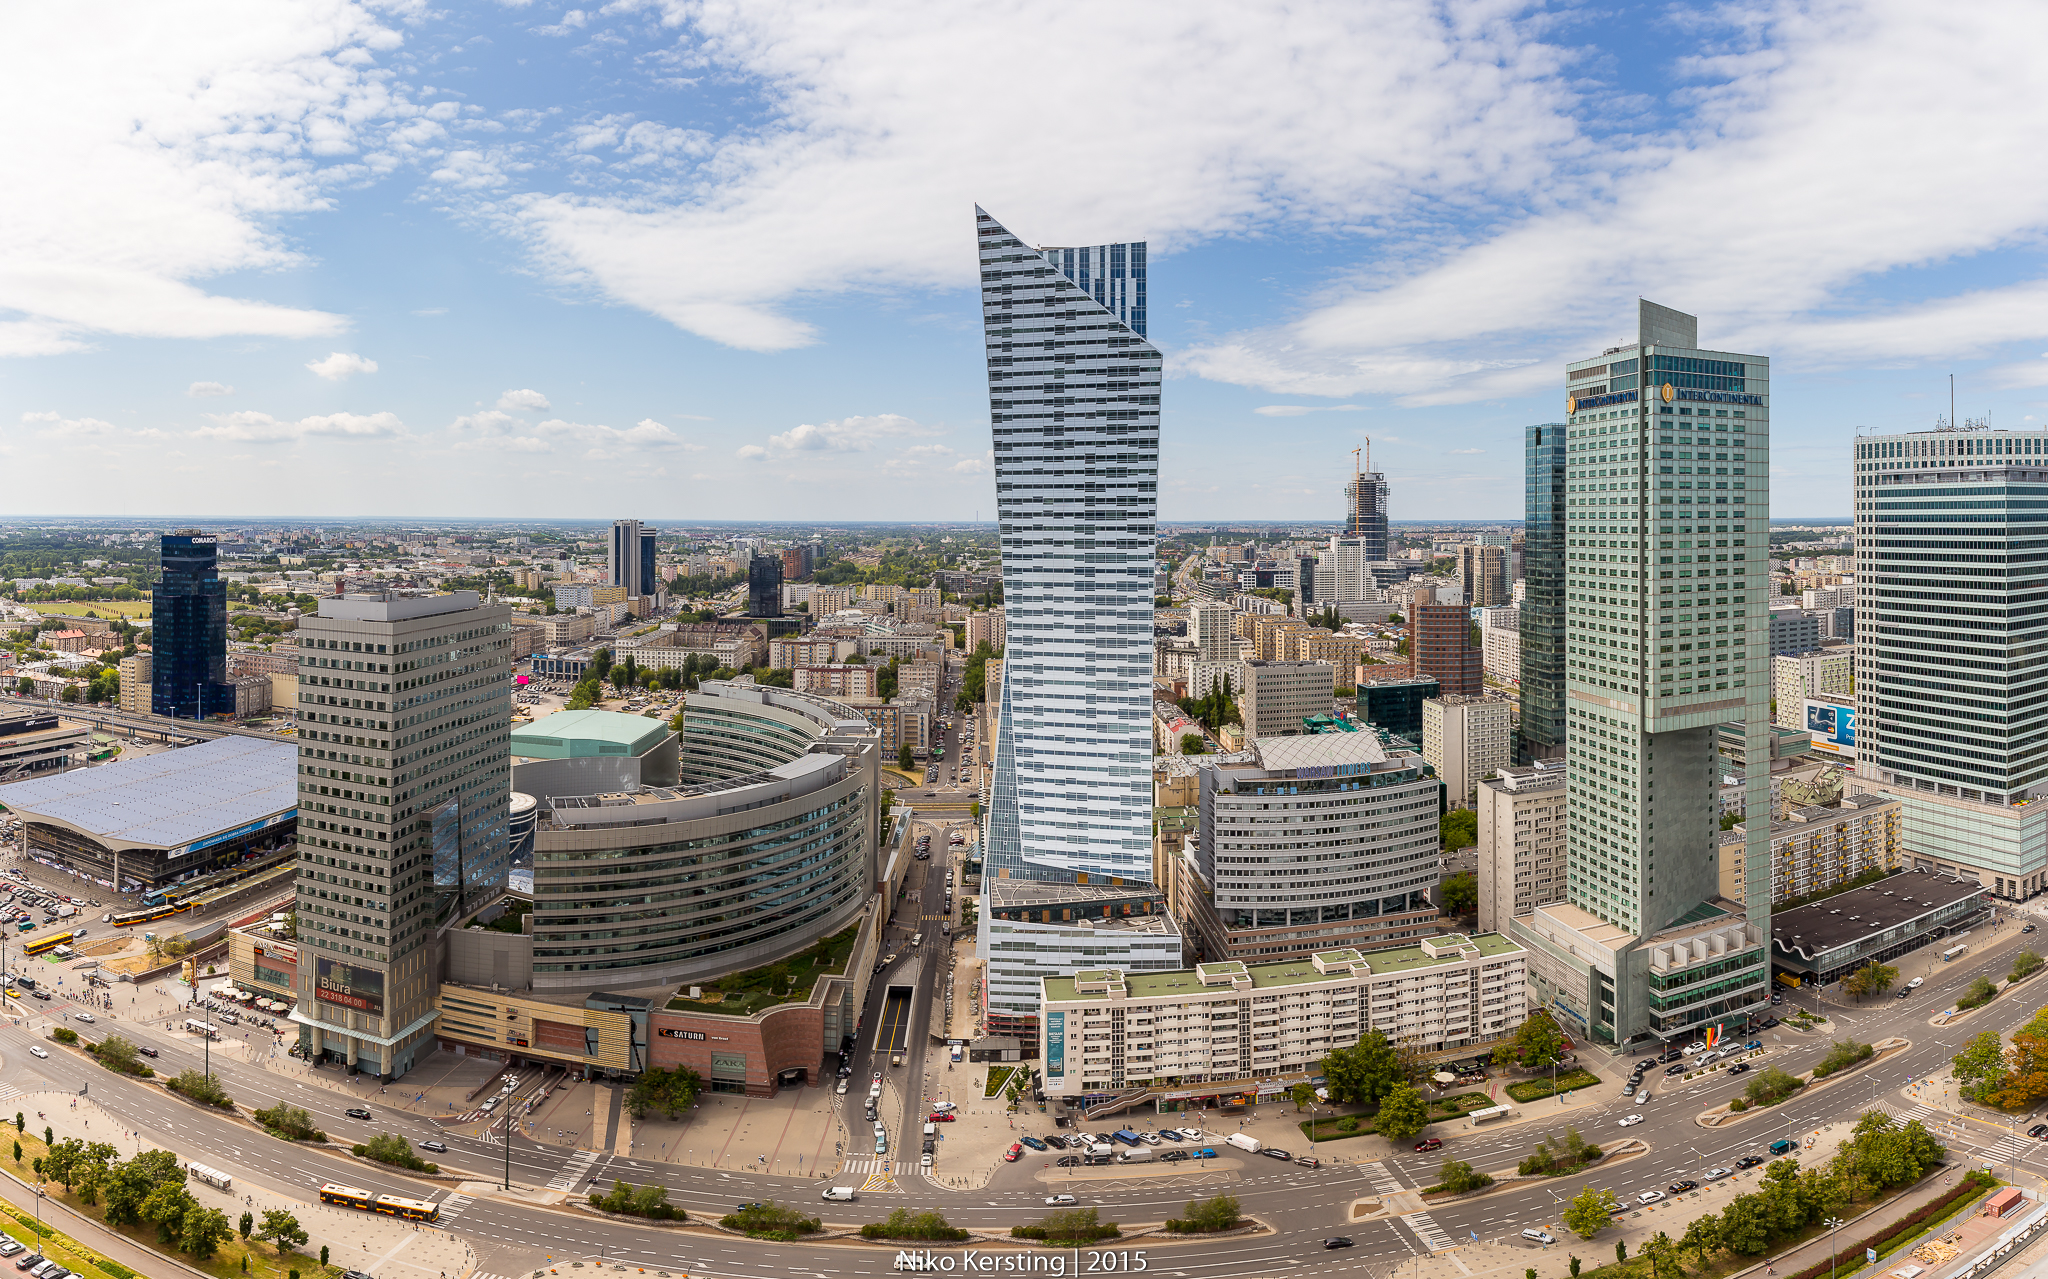 Warsaw Future City, Poland